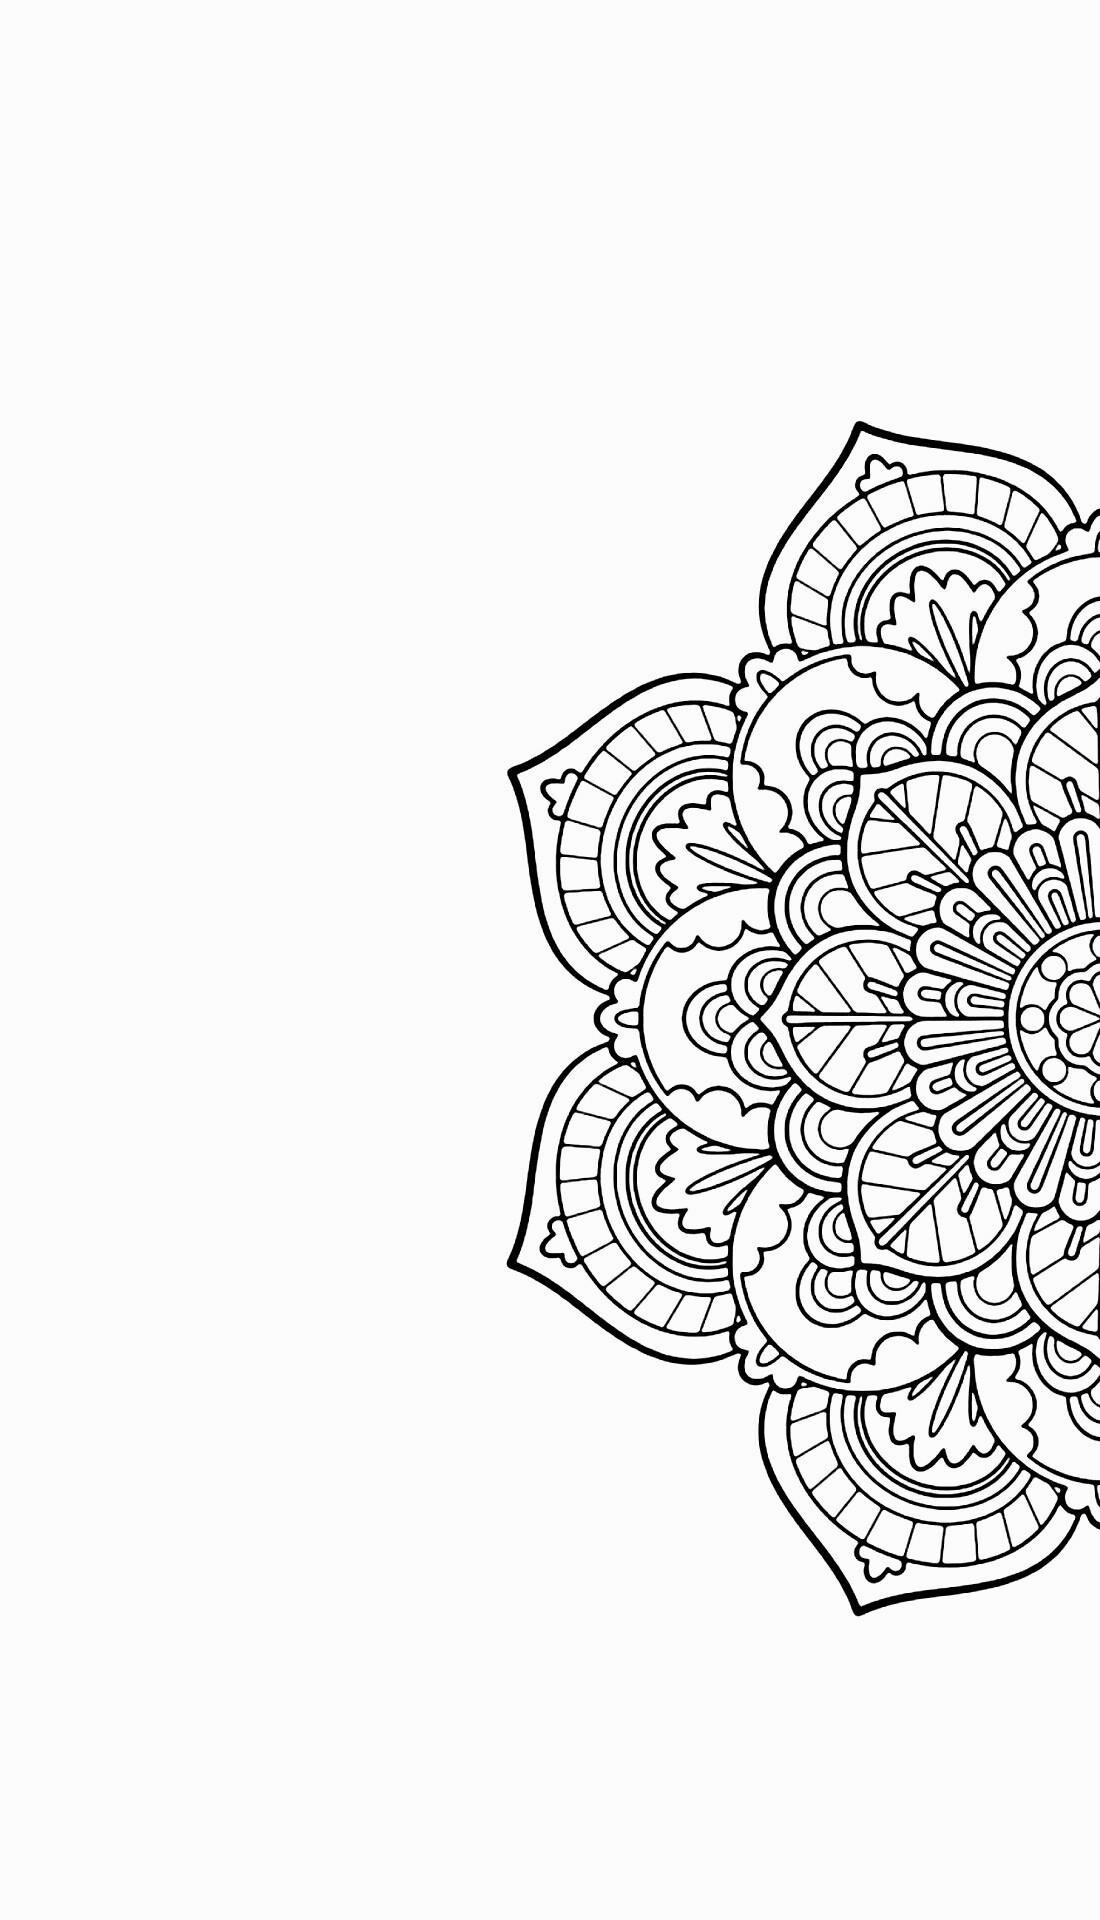 Mandala-Phone-Black-and-White-wallpaper-wp5209147